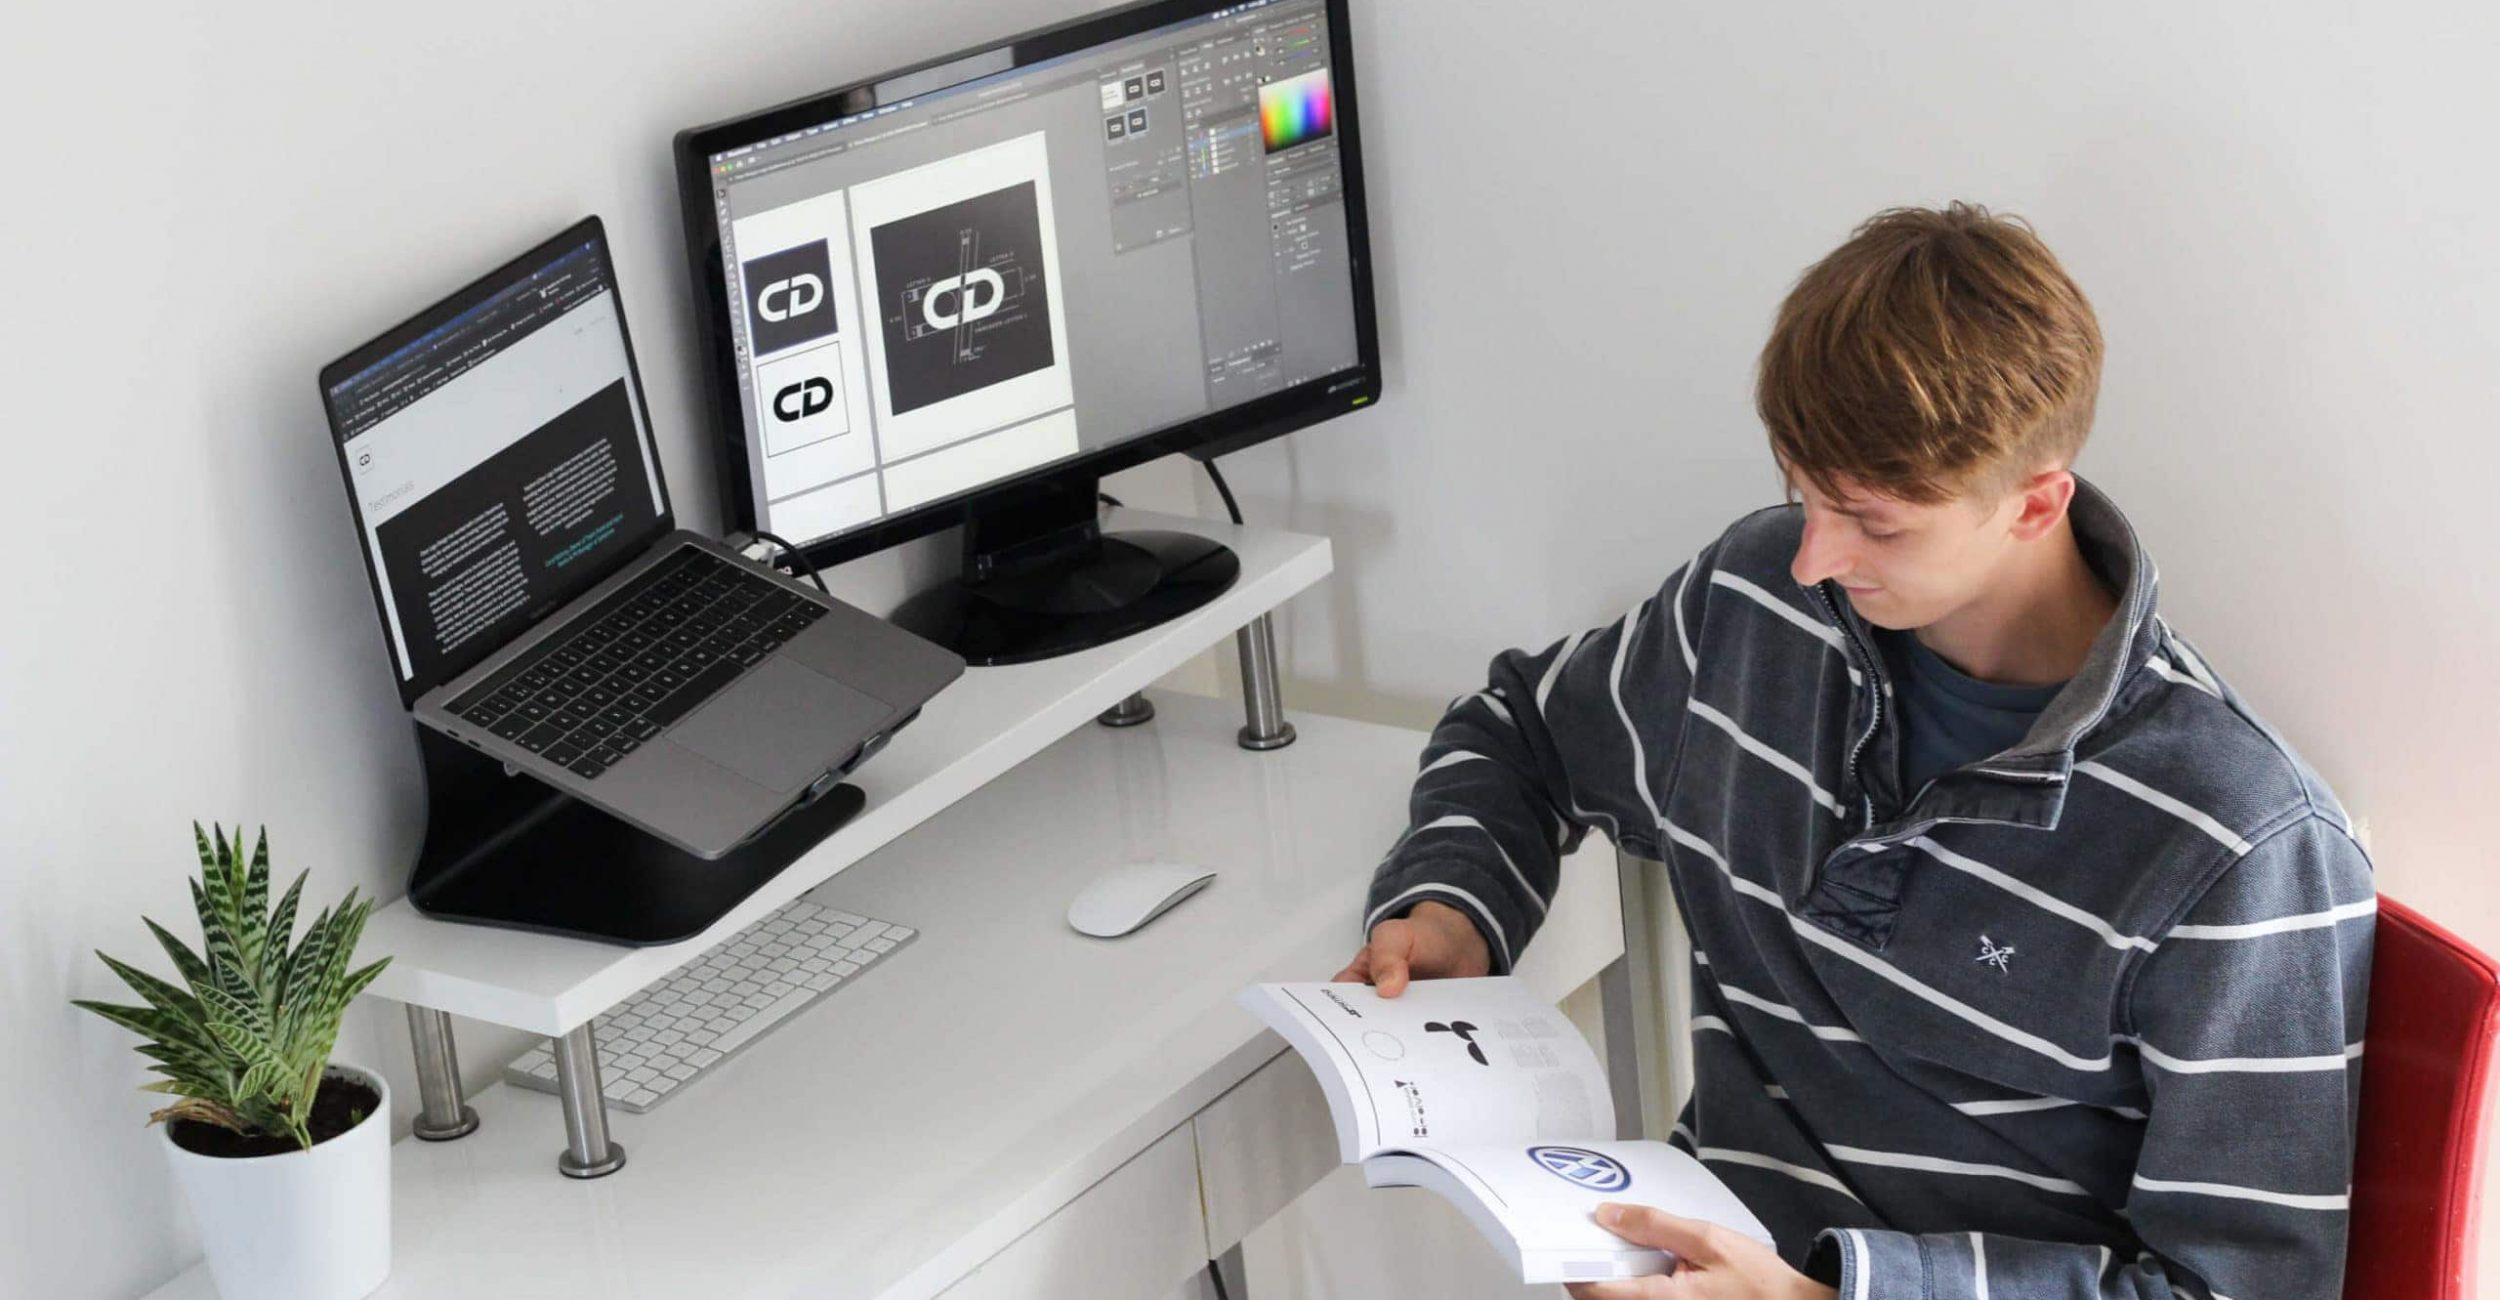 Stephen Cleary - brand designer